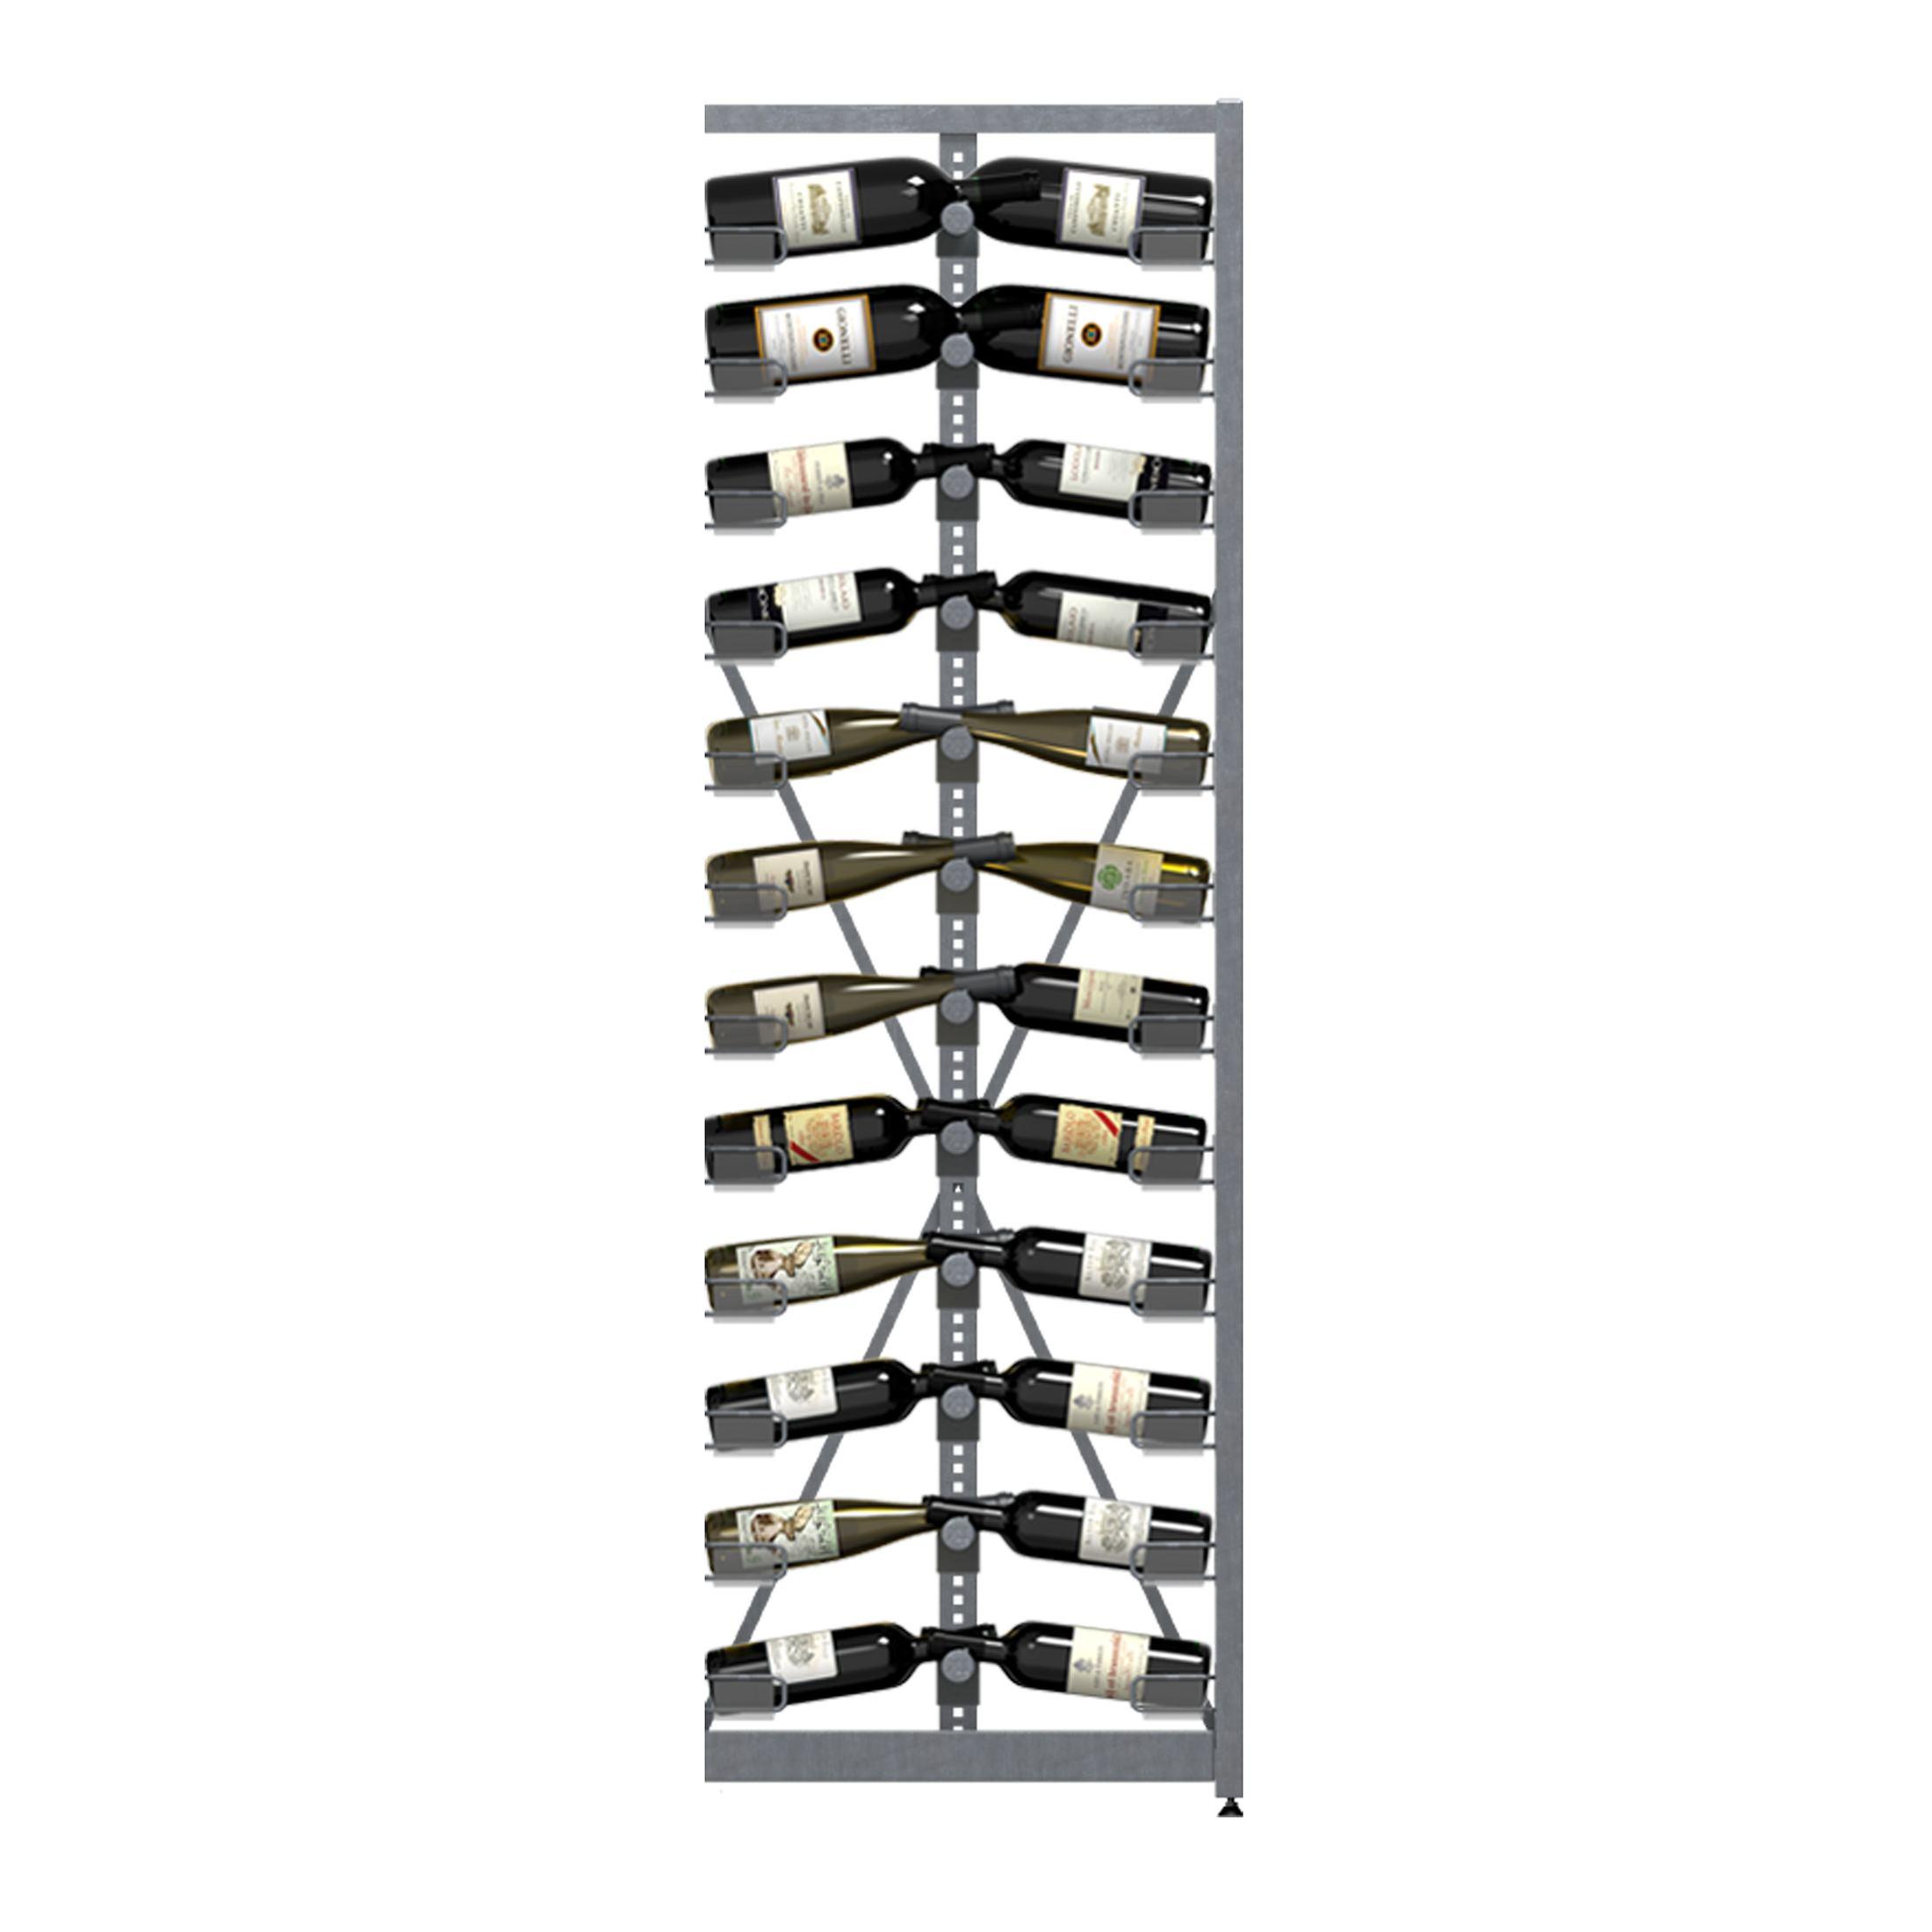 Weinregal Xi Rack 12: Anbaumodul, 12 Ebenen